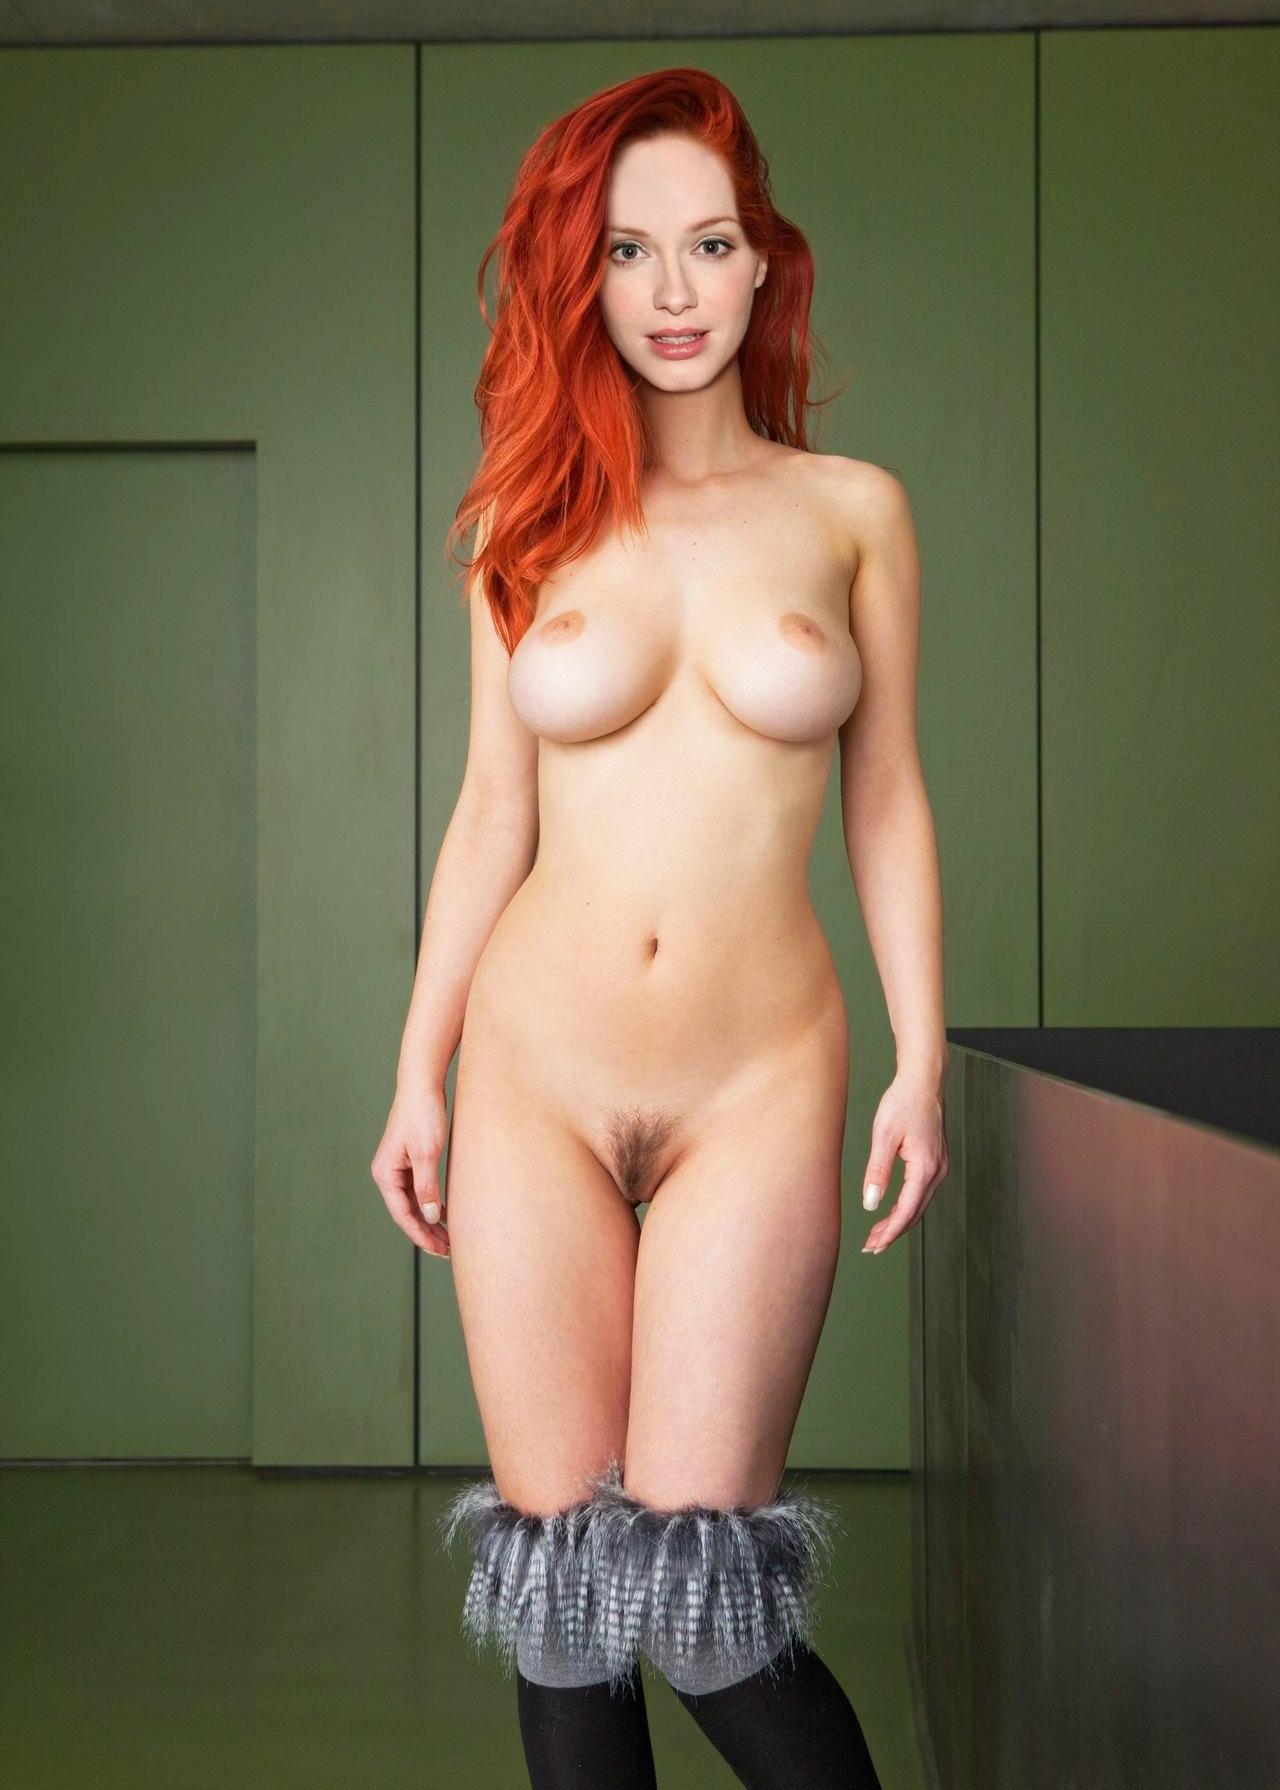 Multiple cumshots on tits